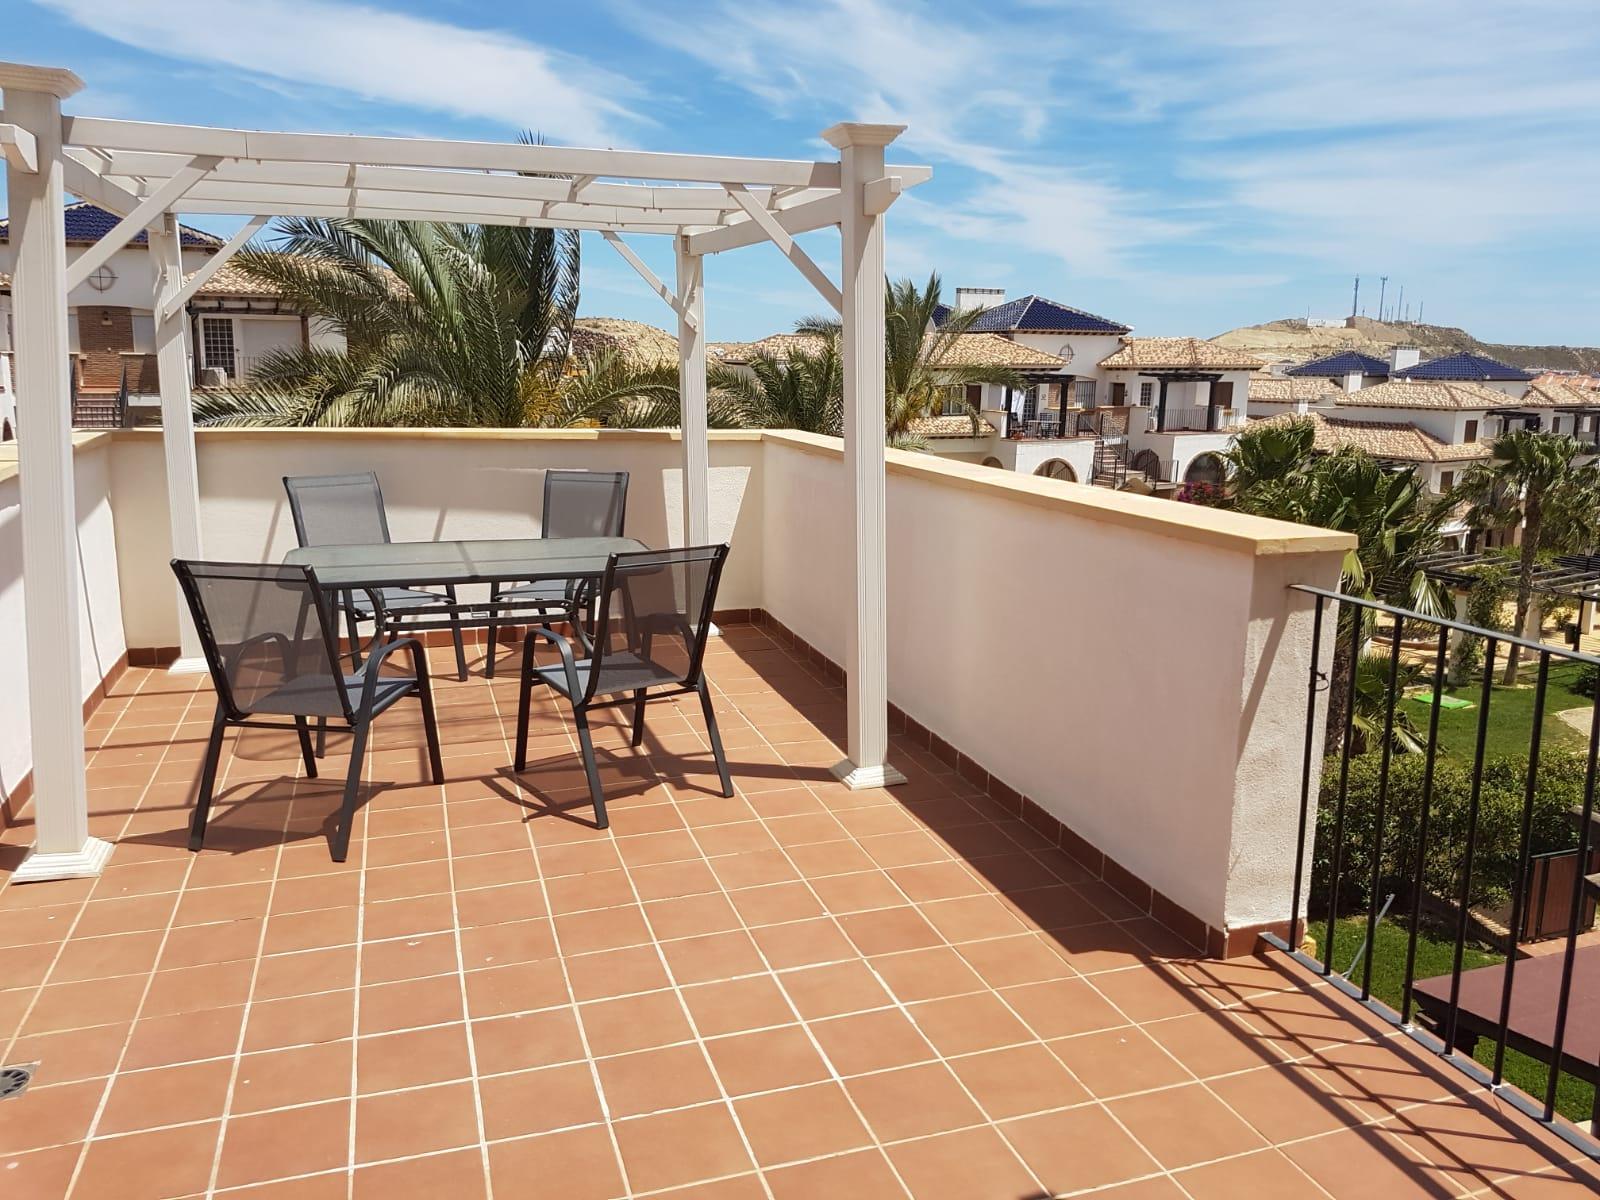 Alquiler de apartamento en Al Andalus Thalassa RA245